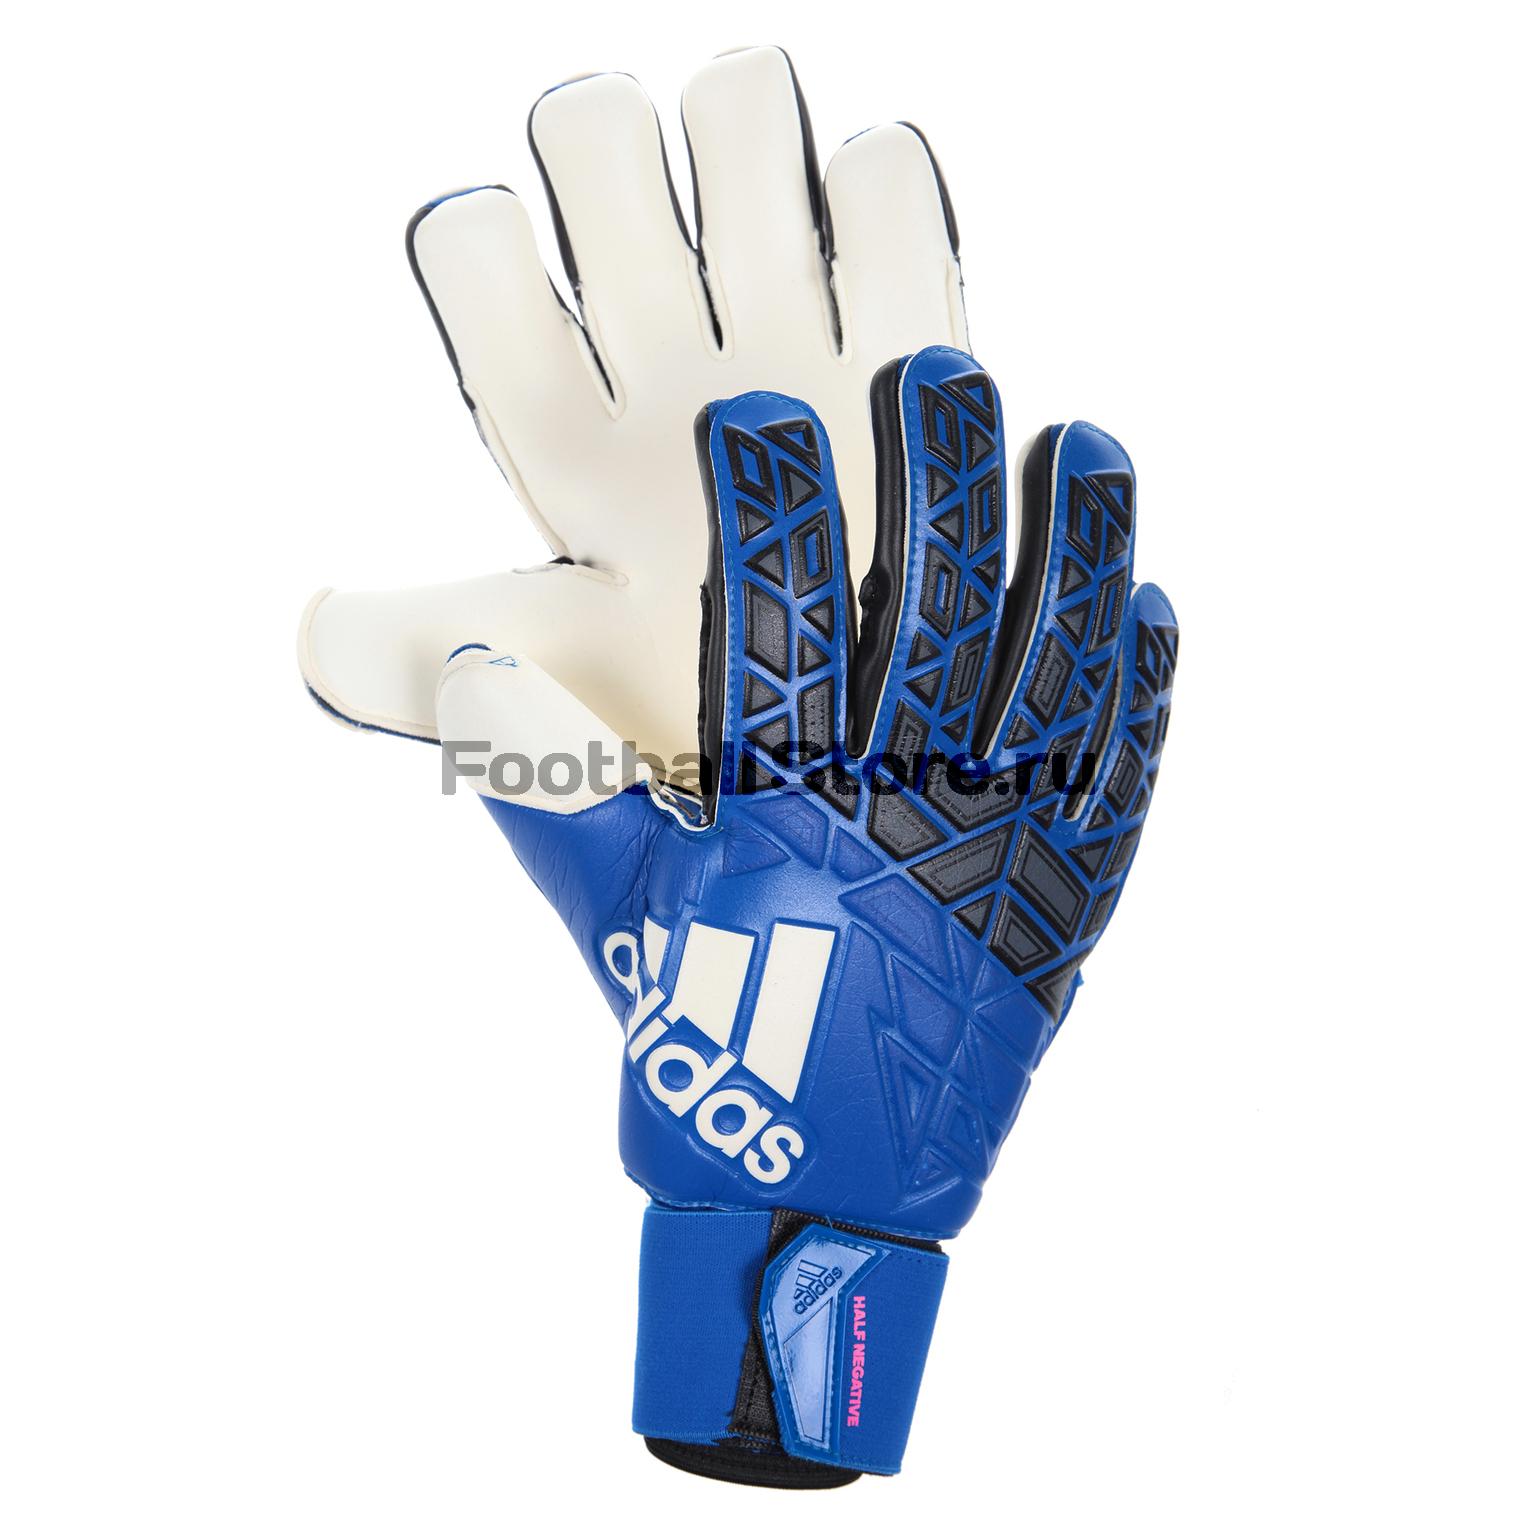 Перчатки вратарские Adidas Ace Half Neg AZ3688 перчатки вратарские adidas ace half neg az3688